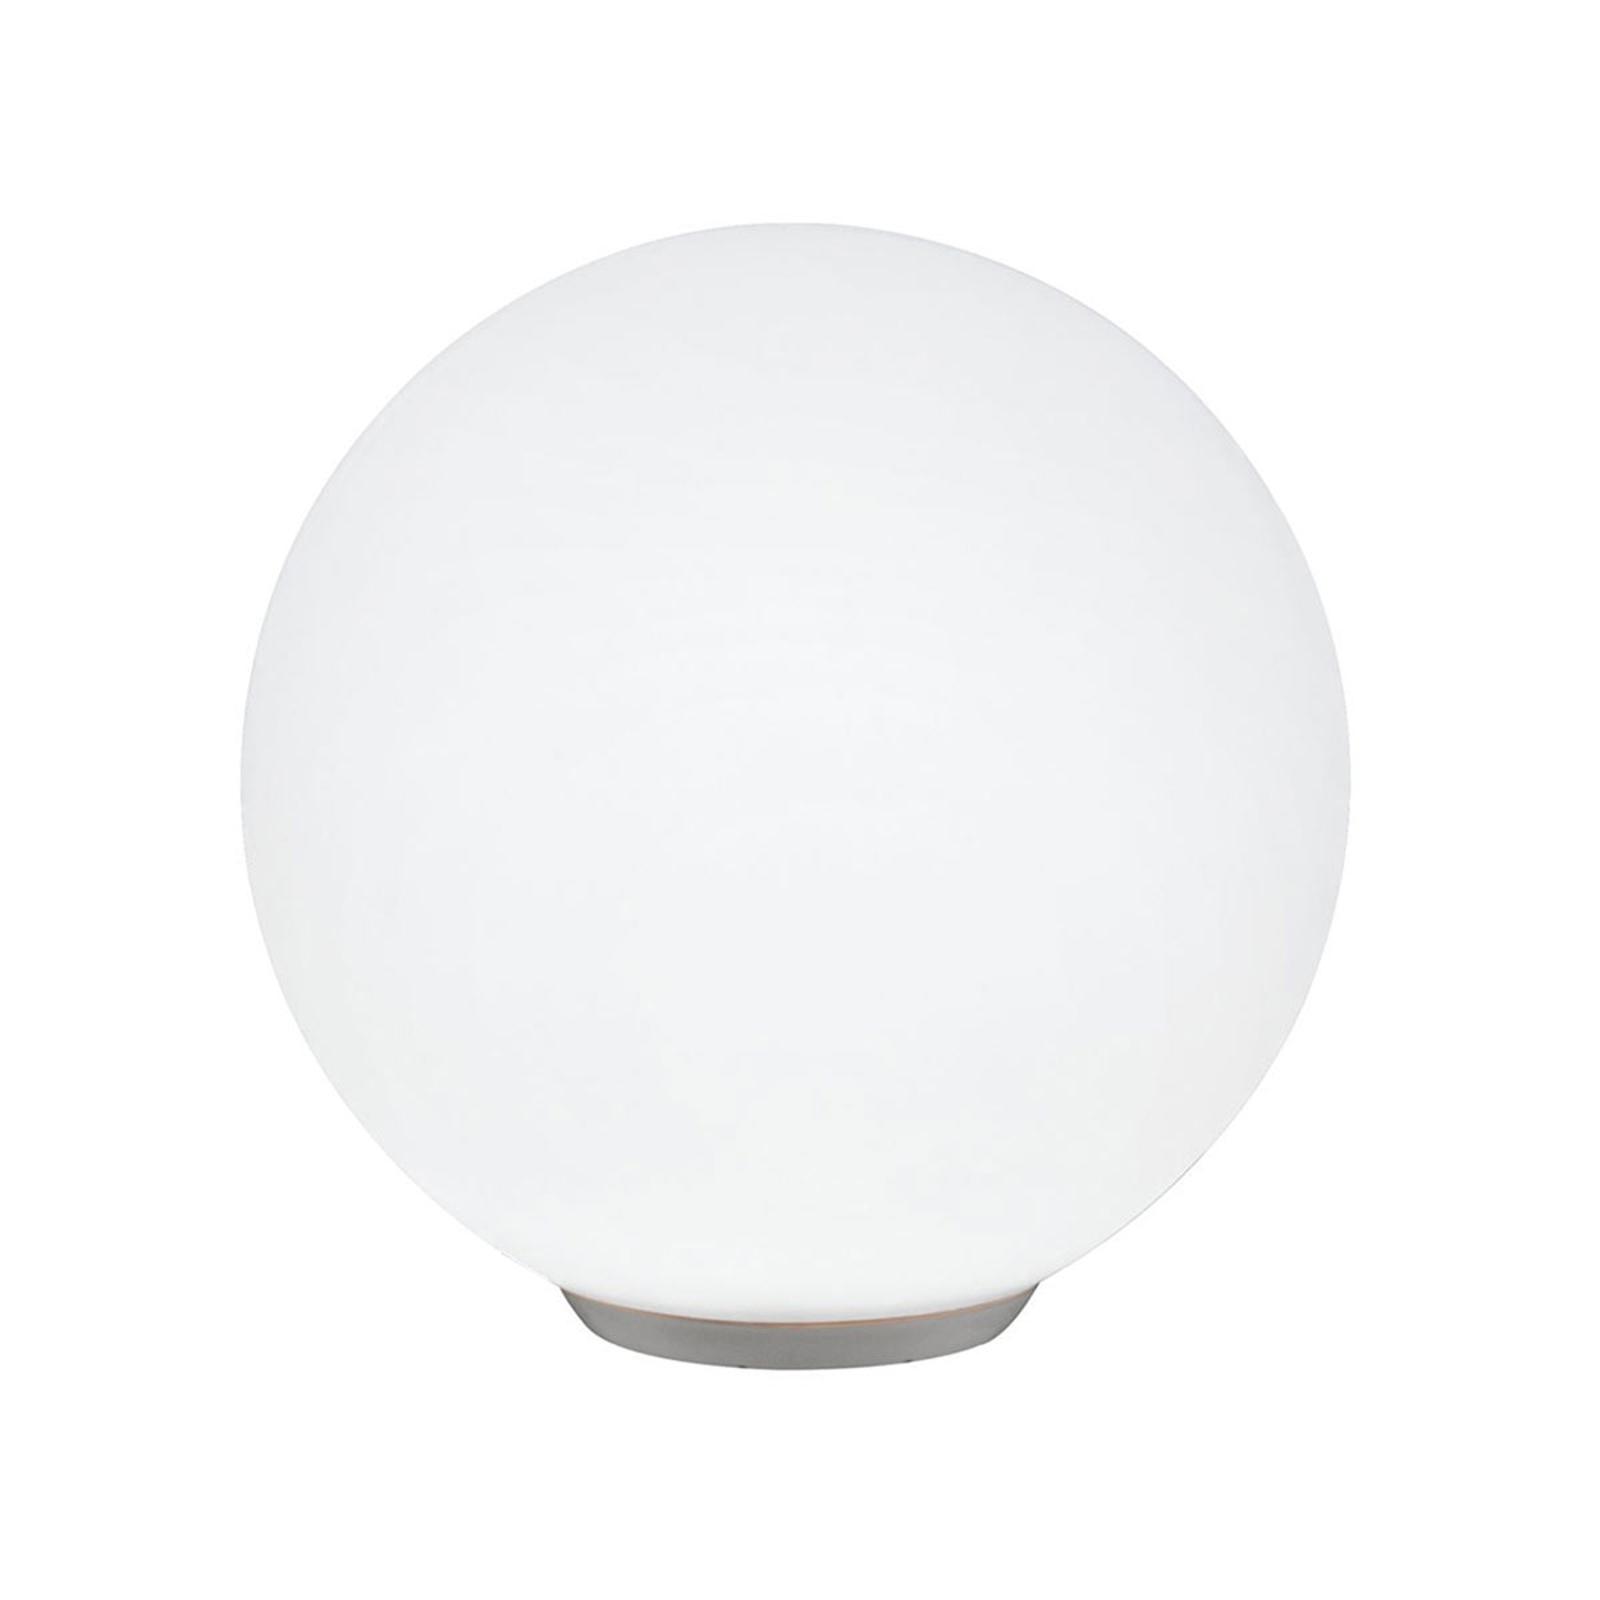 Paulmann Plug & Shine lampe déco Globe ZigBee RGBW